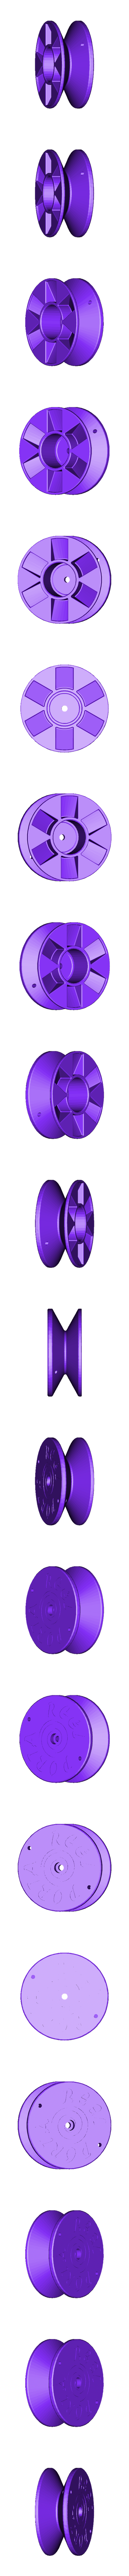 Reel.STL Download free STL file PortaReel Portable Fishing Pole • 3D printable model, mechengineermike